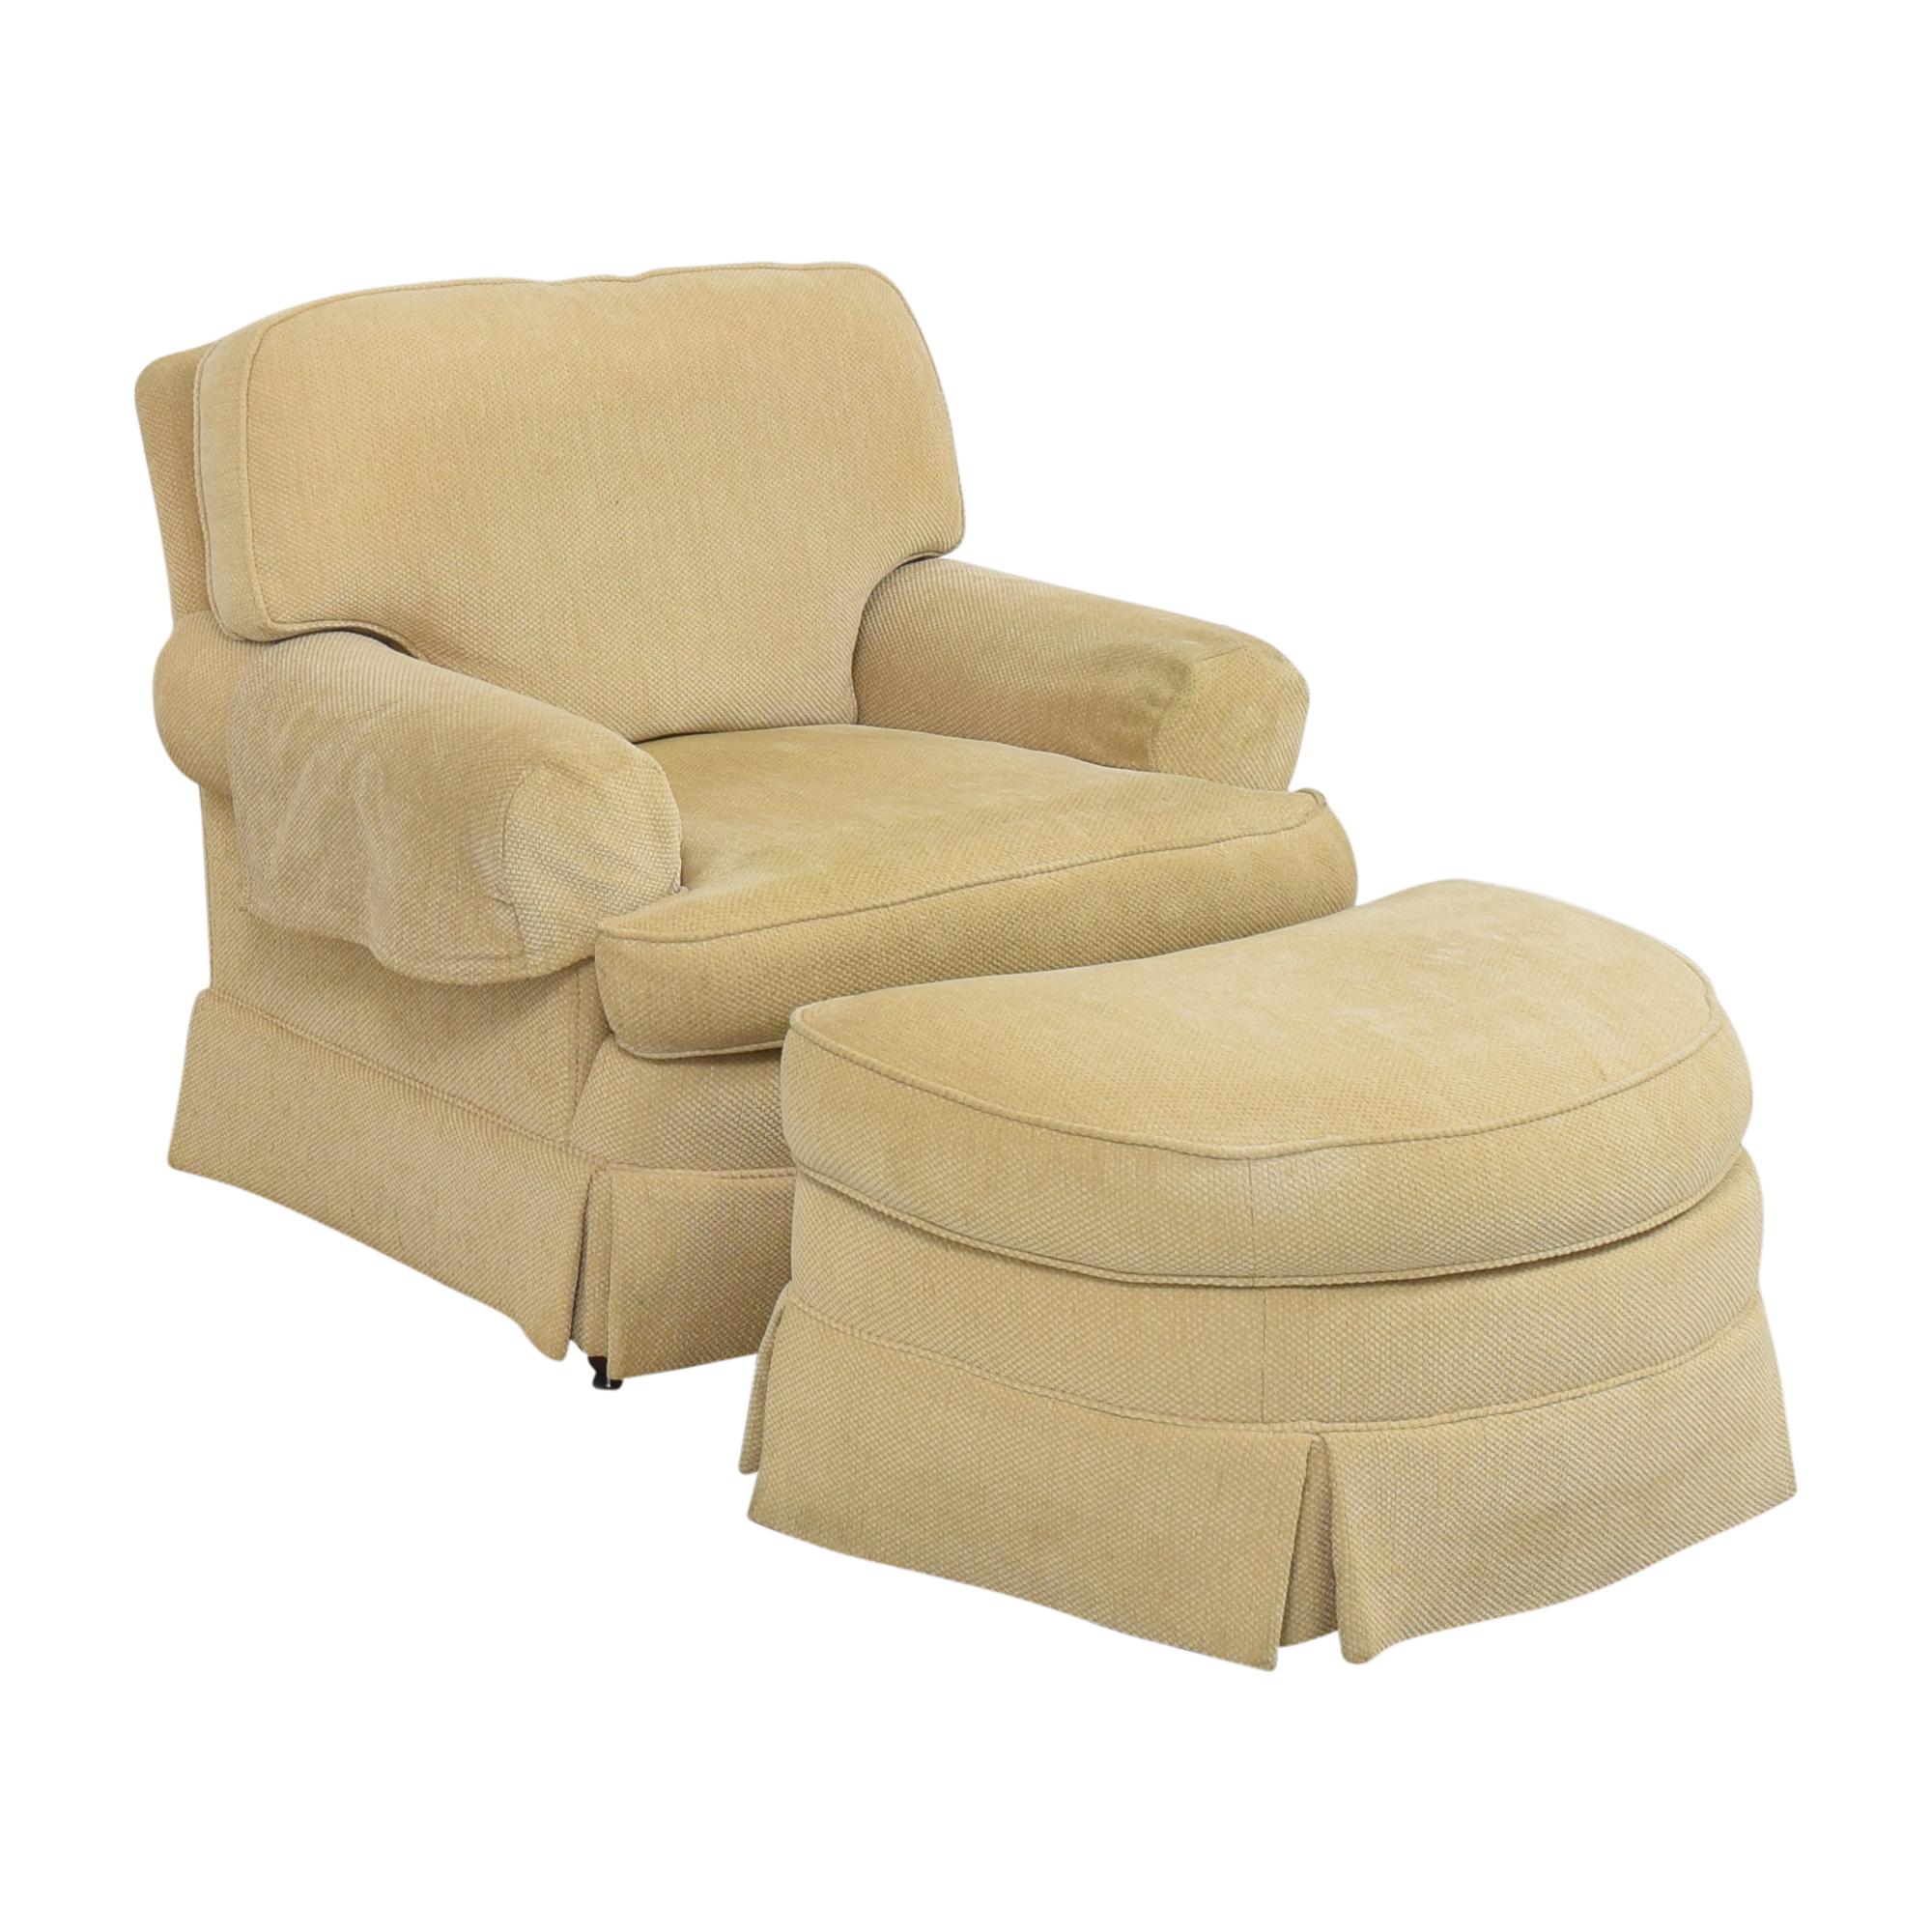 Ralph Lauren Home Ralph Lauren Home Chair with Ottoman dimensions